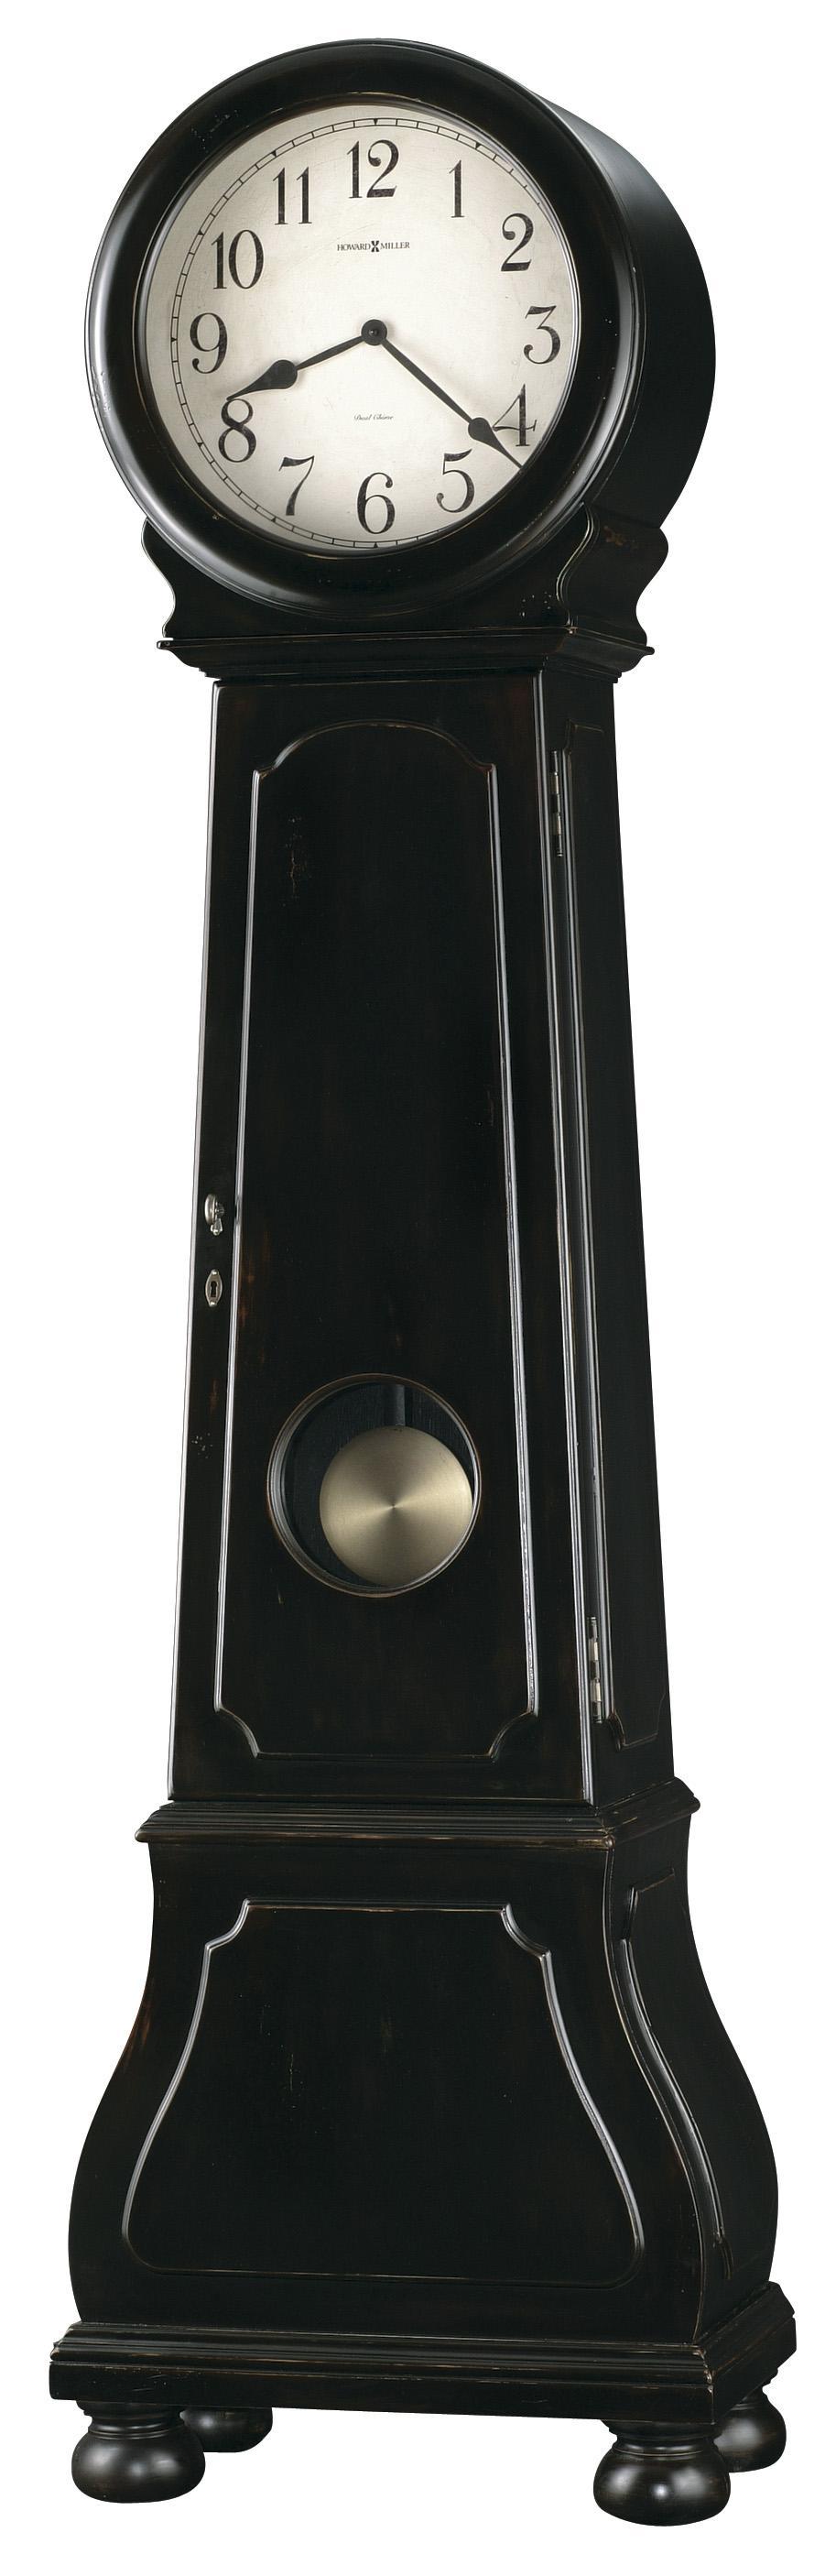 Howard Miller Clocks Nashua Grandfather Clock - Item Number: 615-005